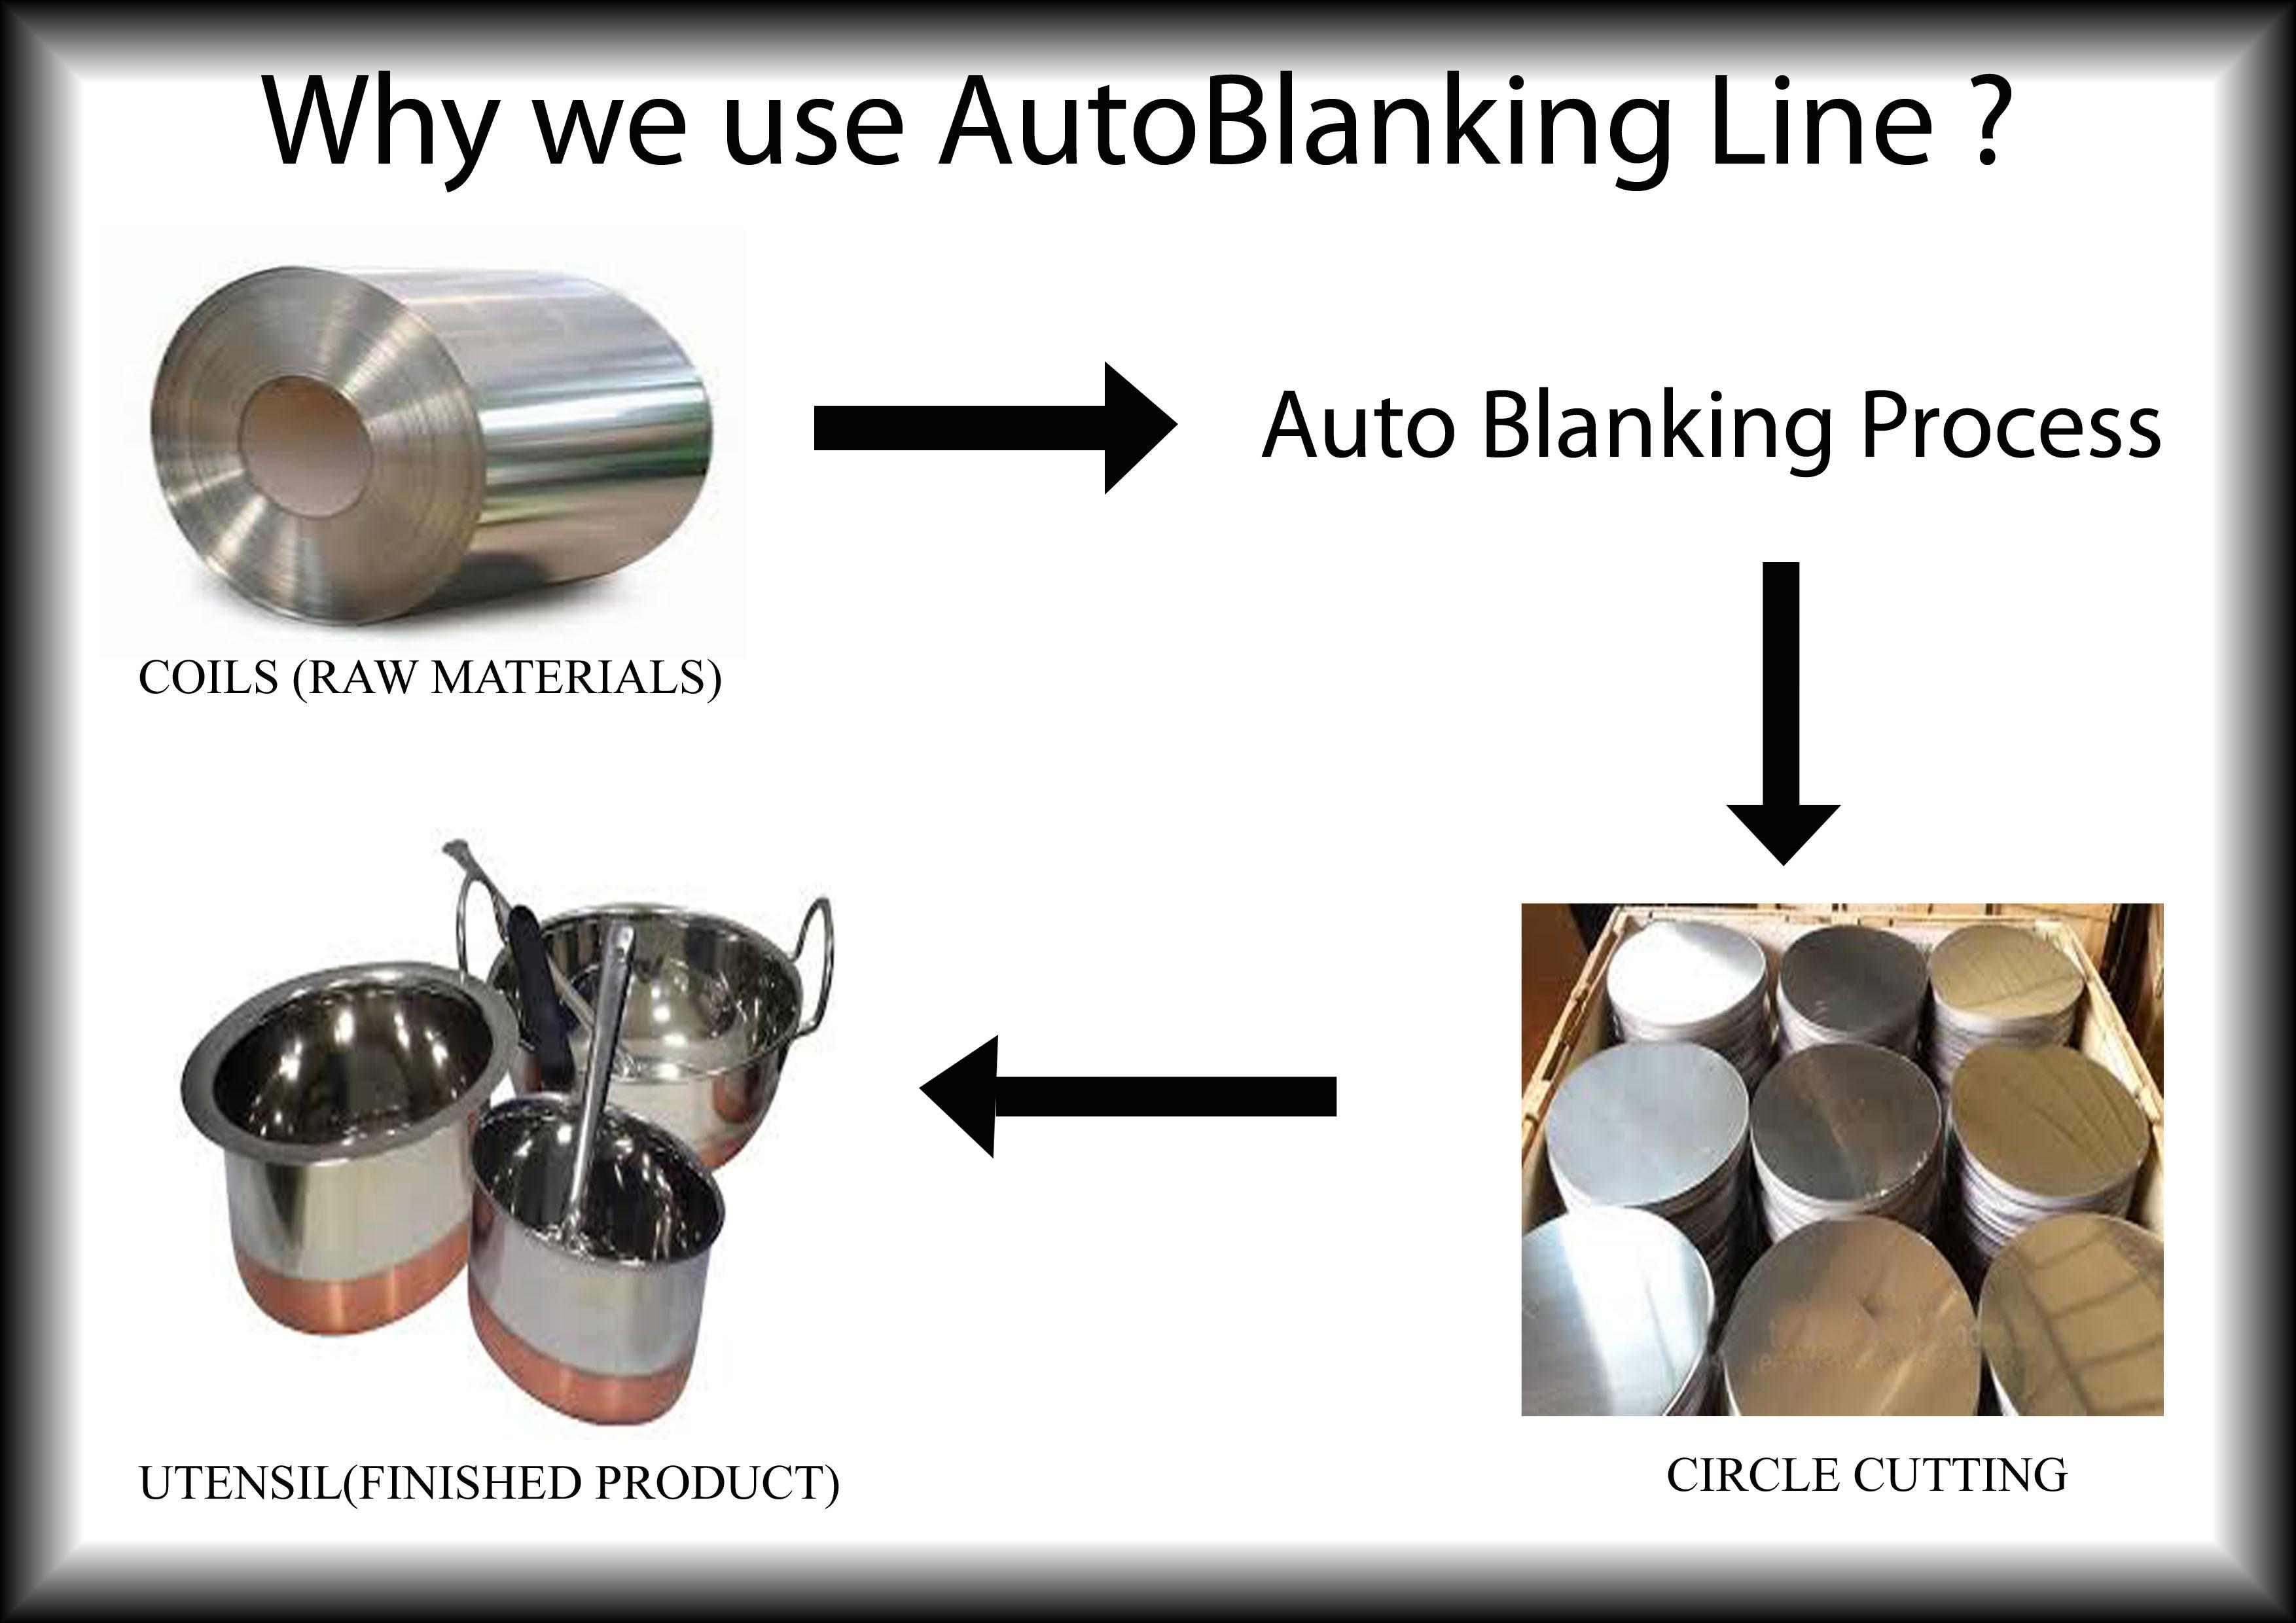 Auto Blanking Line